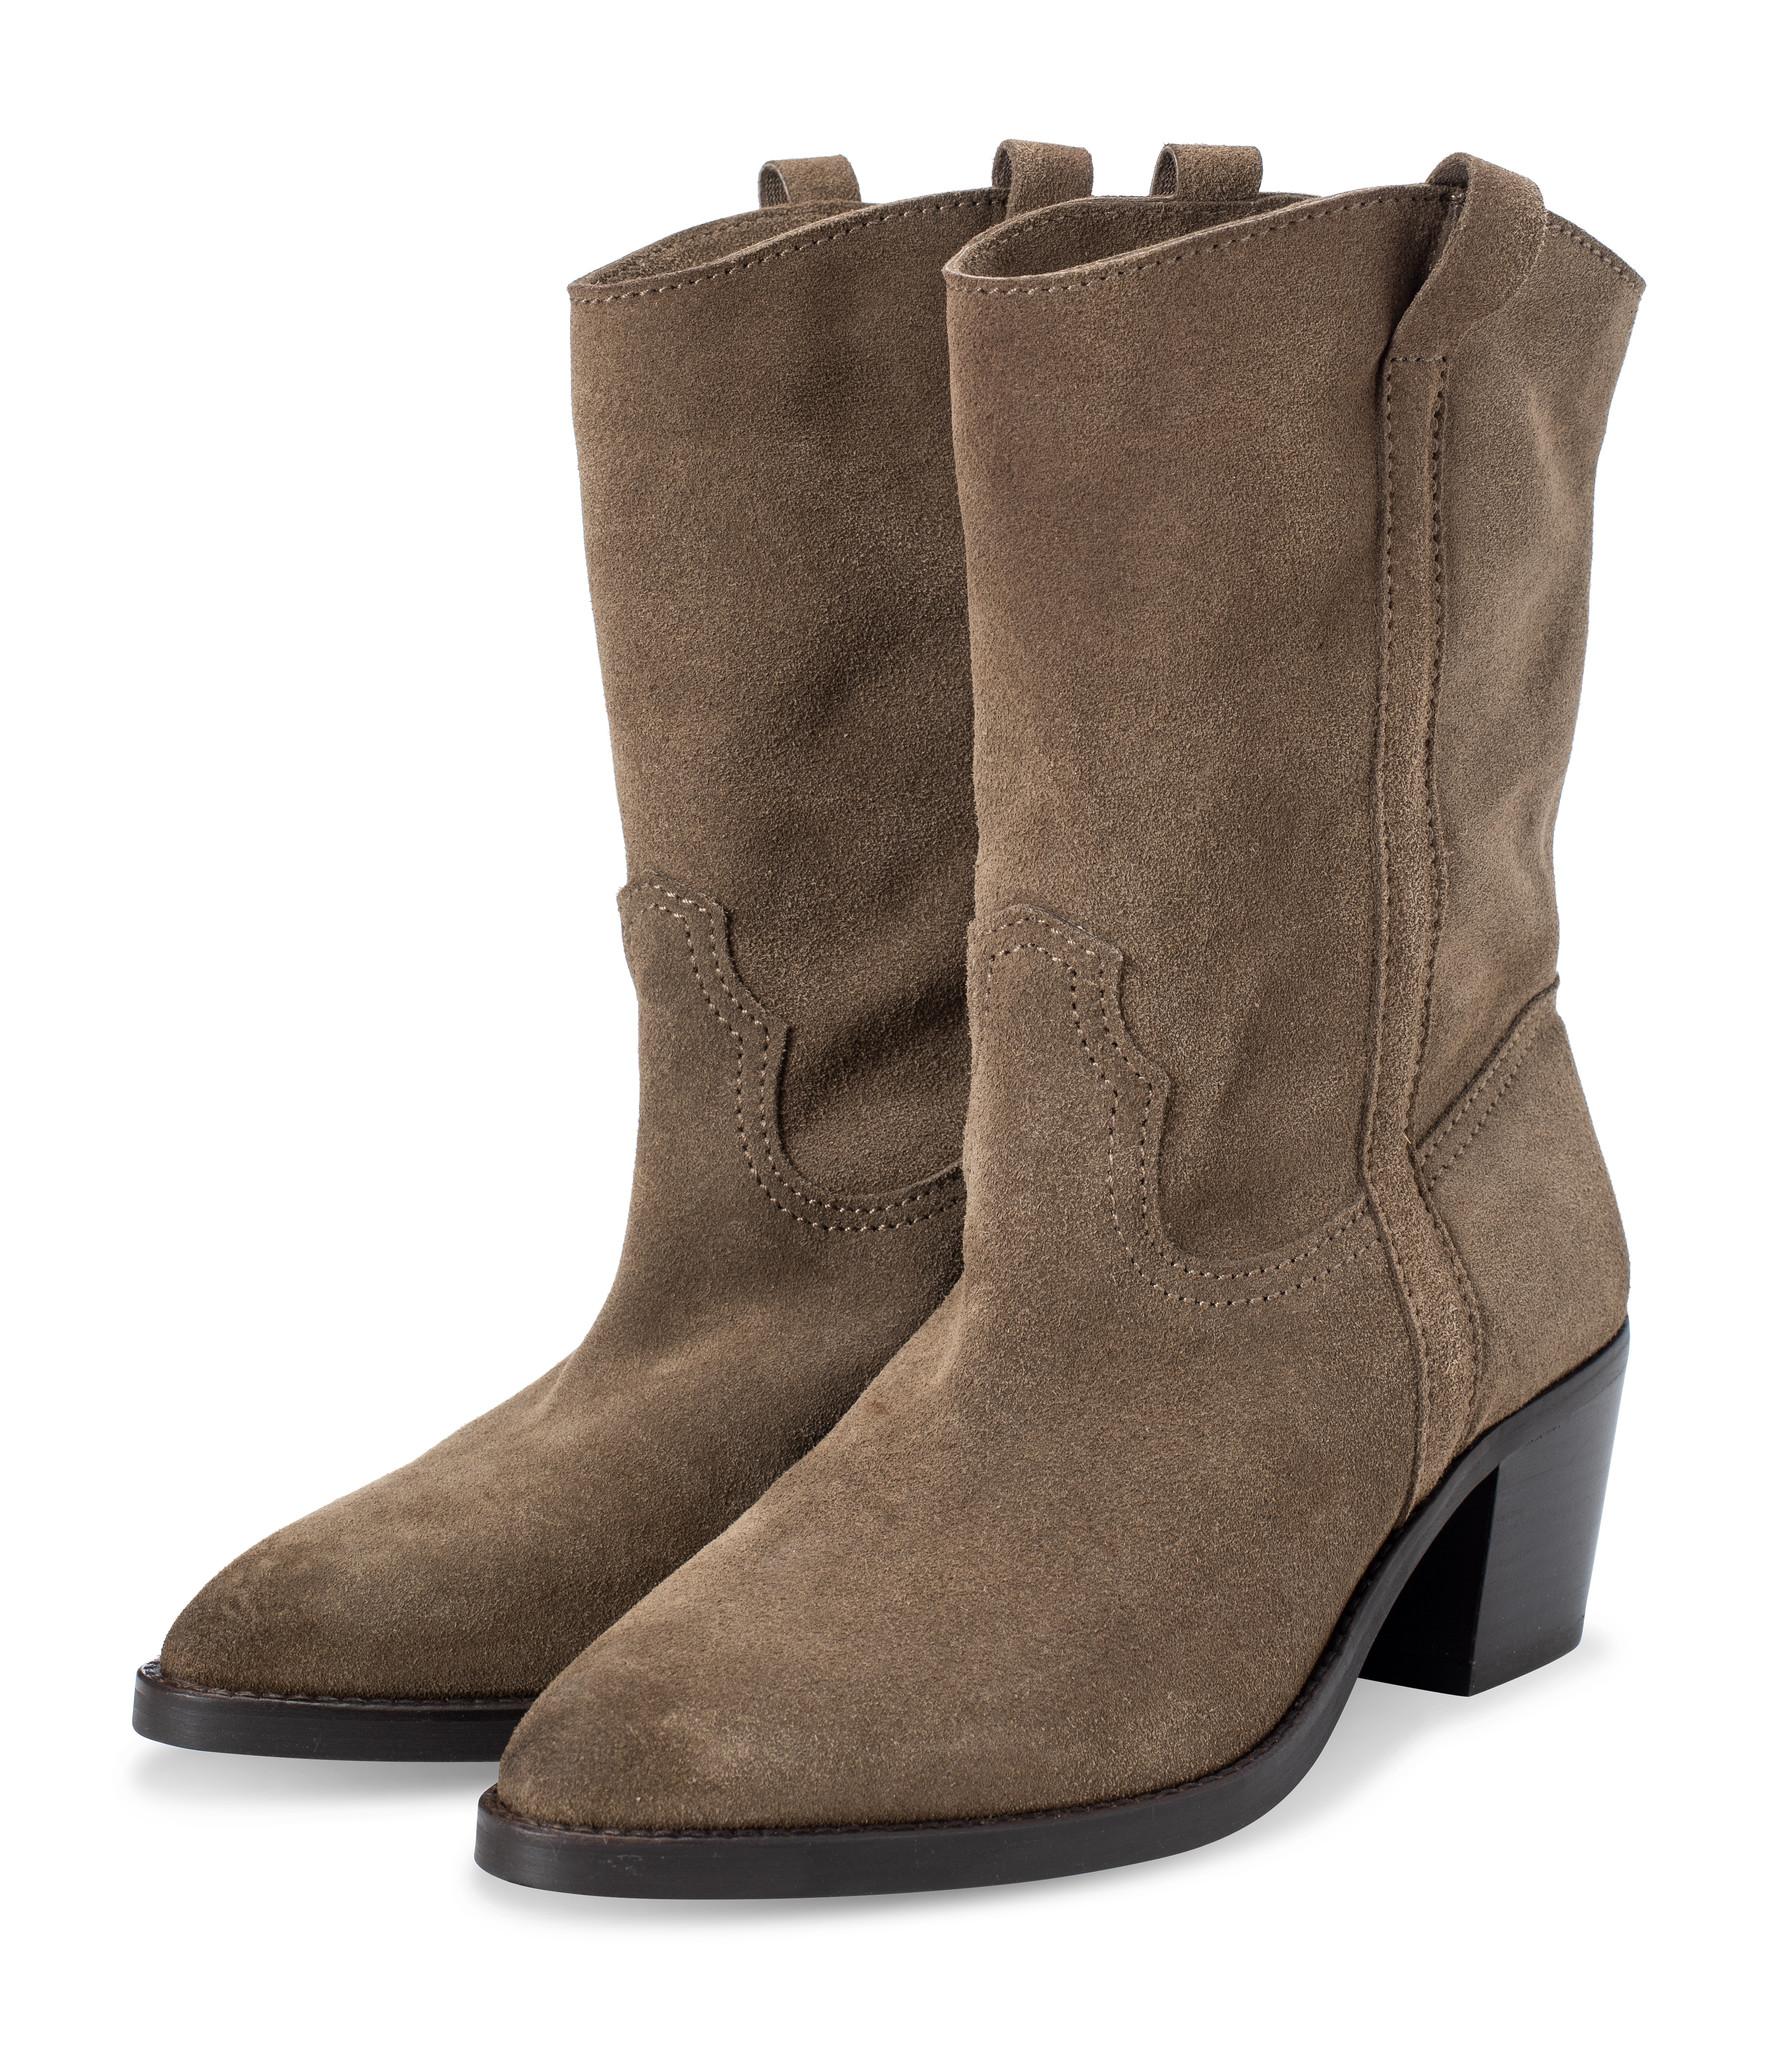 YAYA SUEDE COWBOY BOOTS -134359